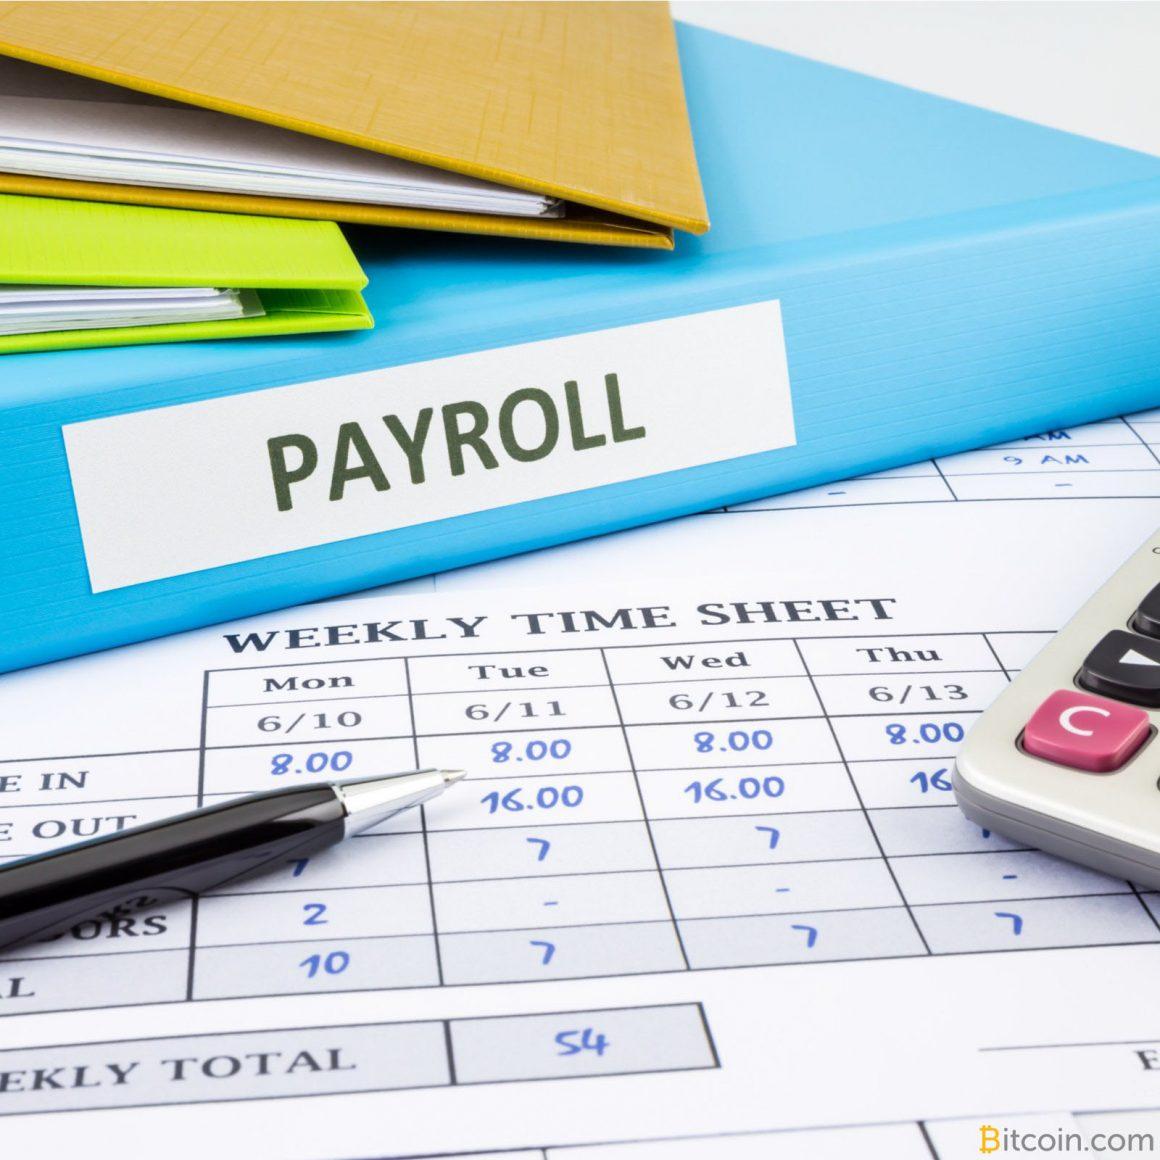 payroll 1160x1160 - ICO ImWage: una nuova gestione delle buste paga targata Bitwage